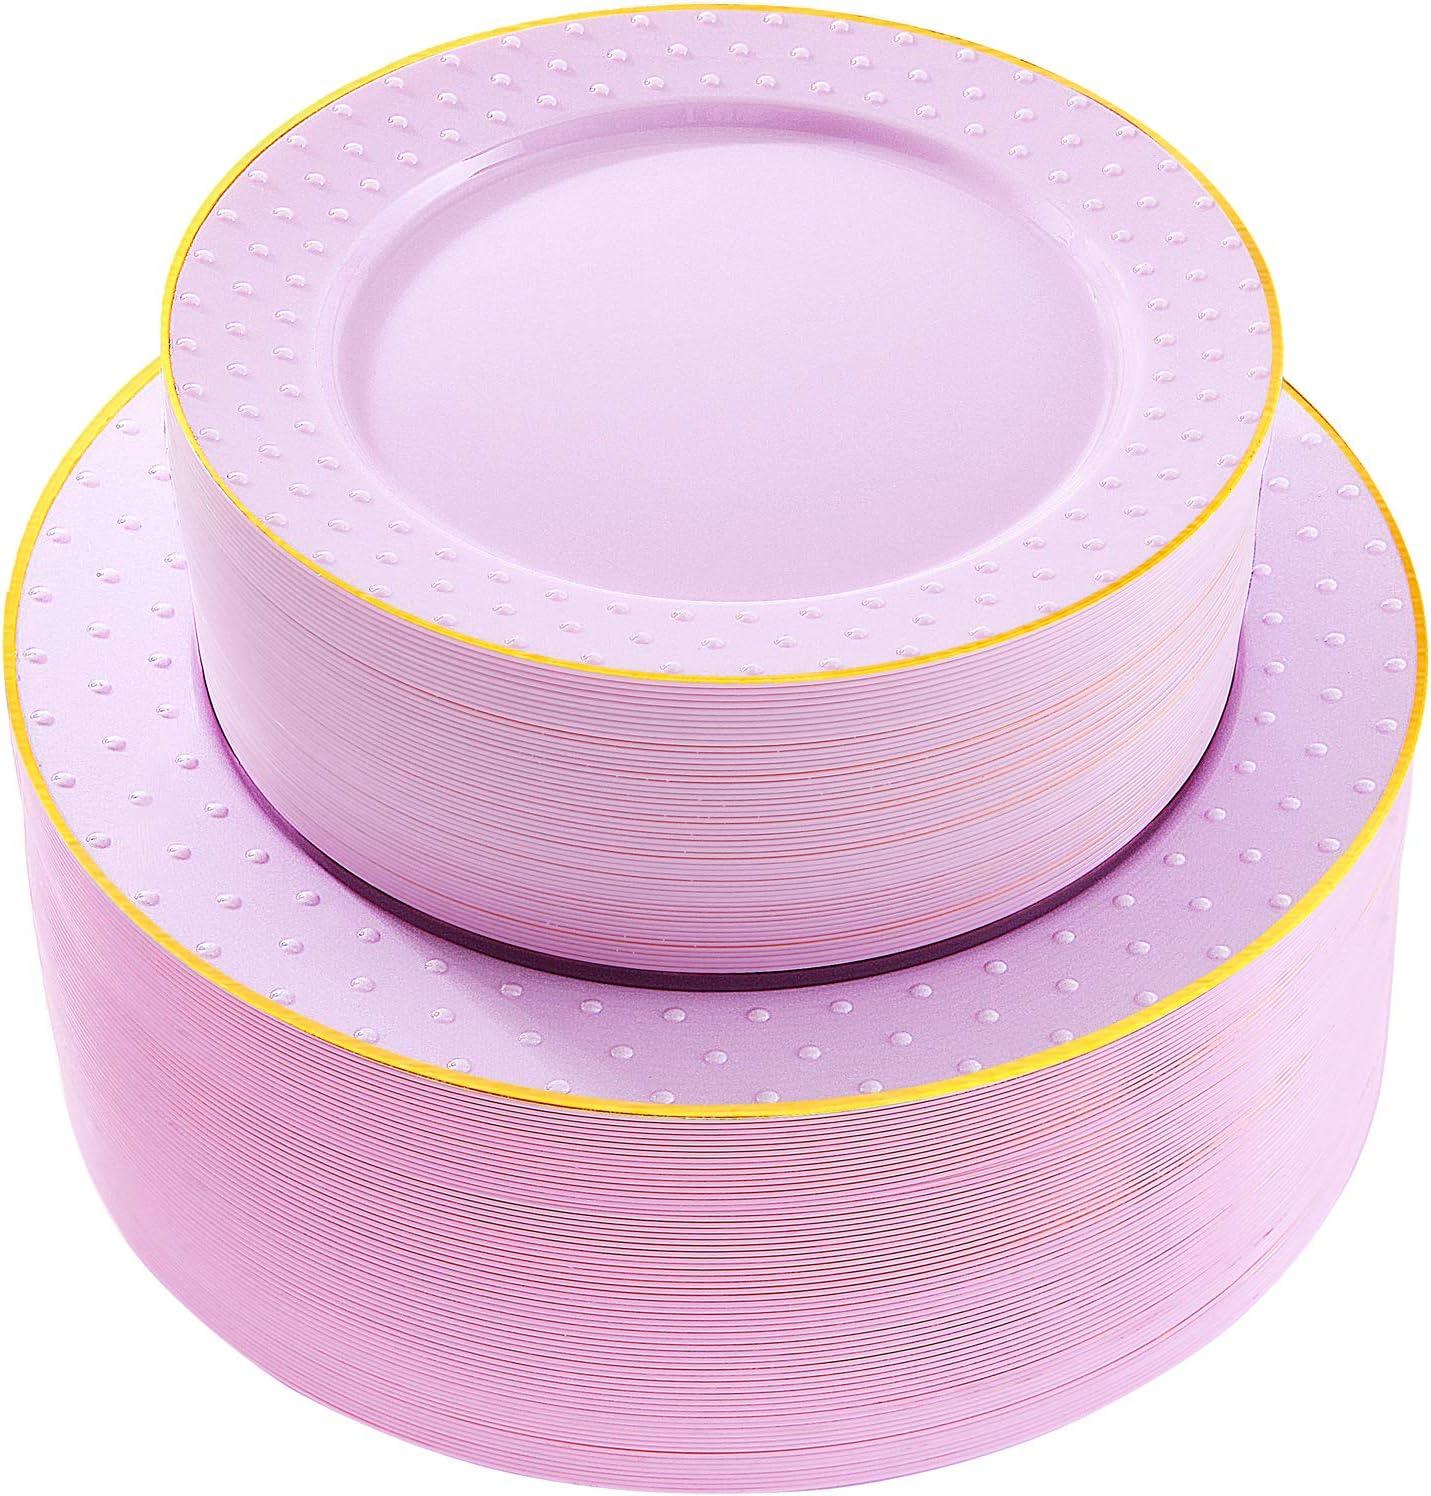 Supernal 102pcs Disposable Plastic Plates Purple Plastic Plates with Gold rim Durable Plastic Plates Heavy Duty 51 Dinner Plates and 51 Dessert Plates